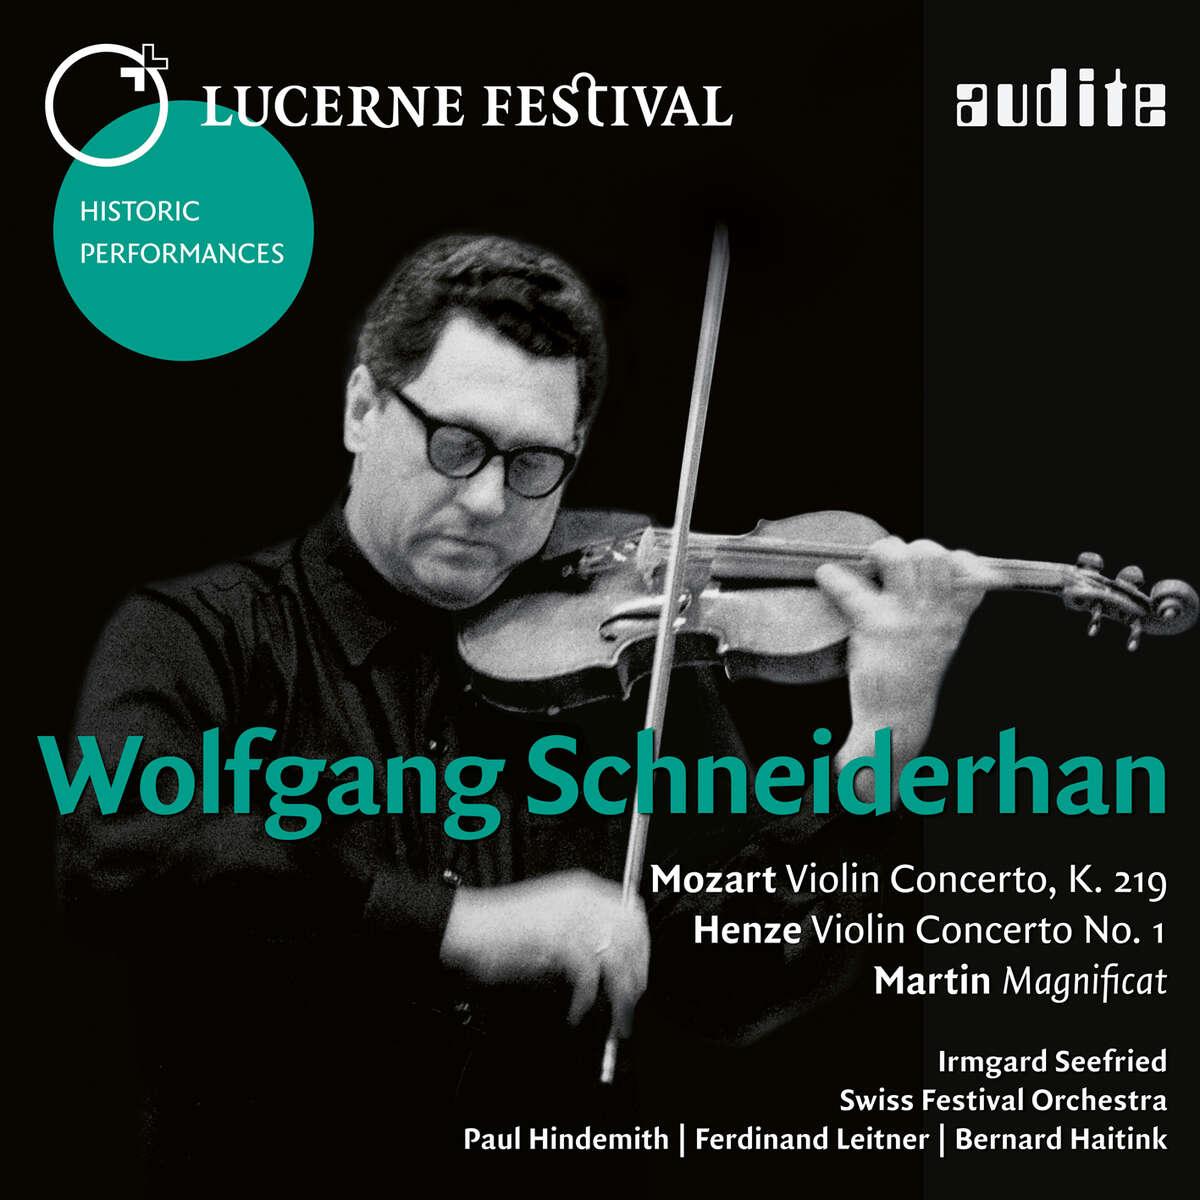 audite! - Wolfgang Schneiderhan plays Mozart, Henze & Martin_LUCERNE ...